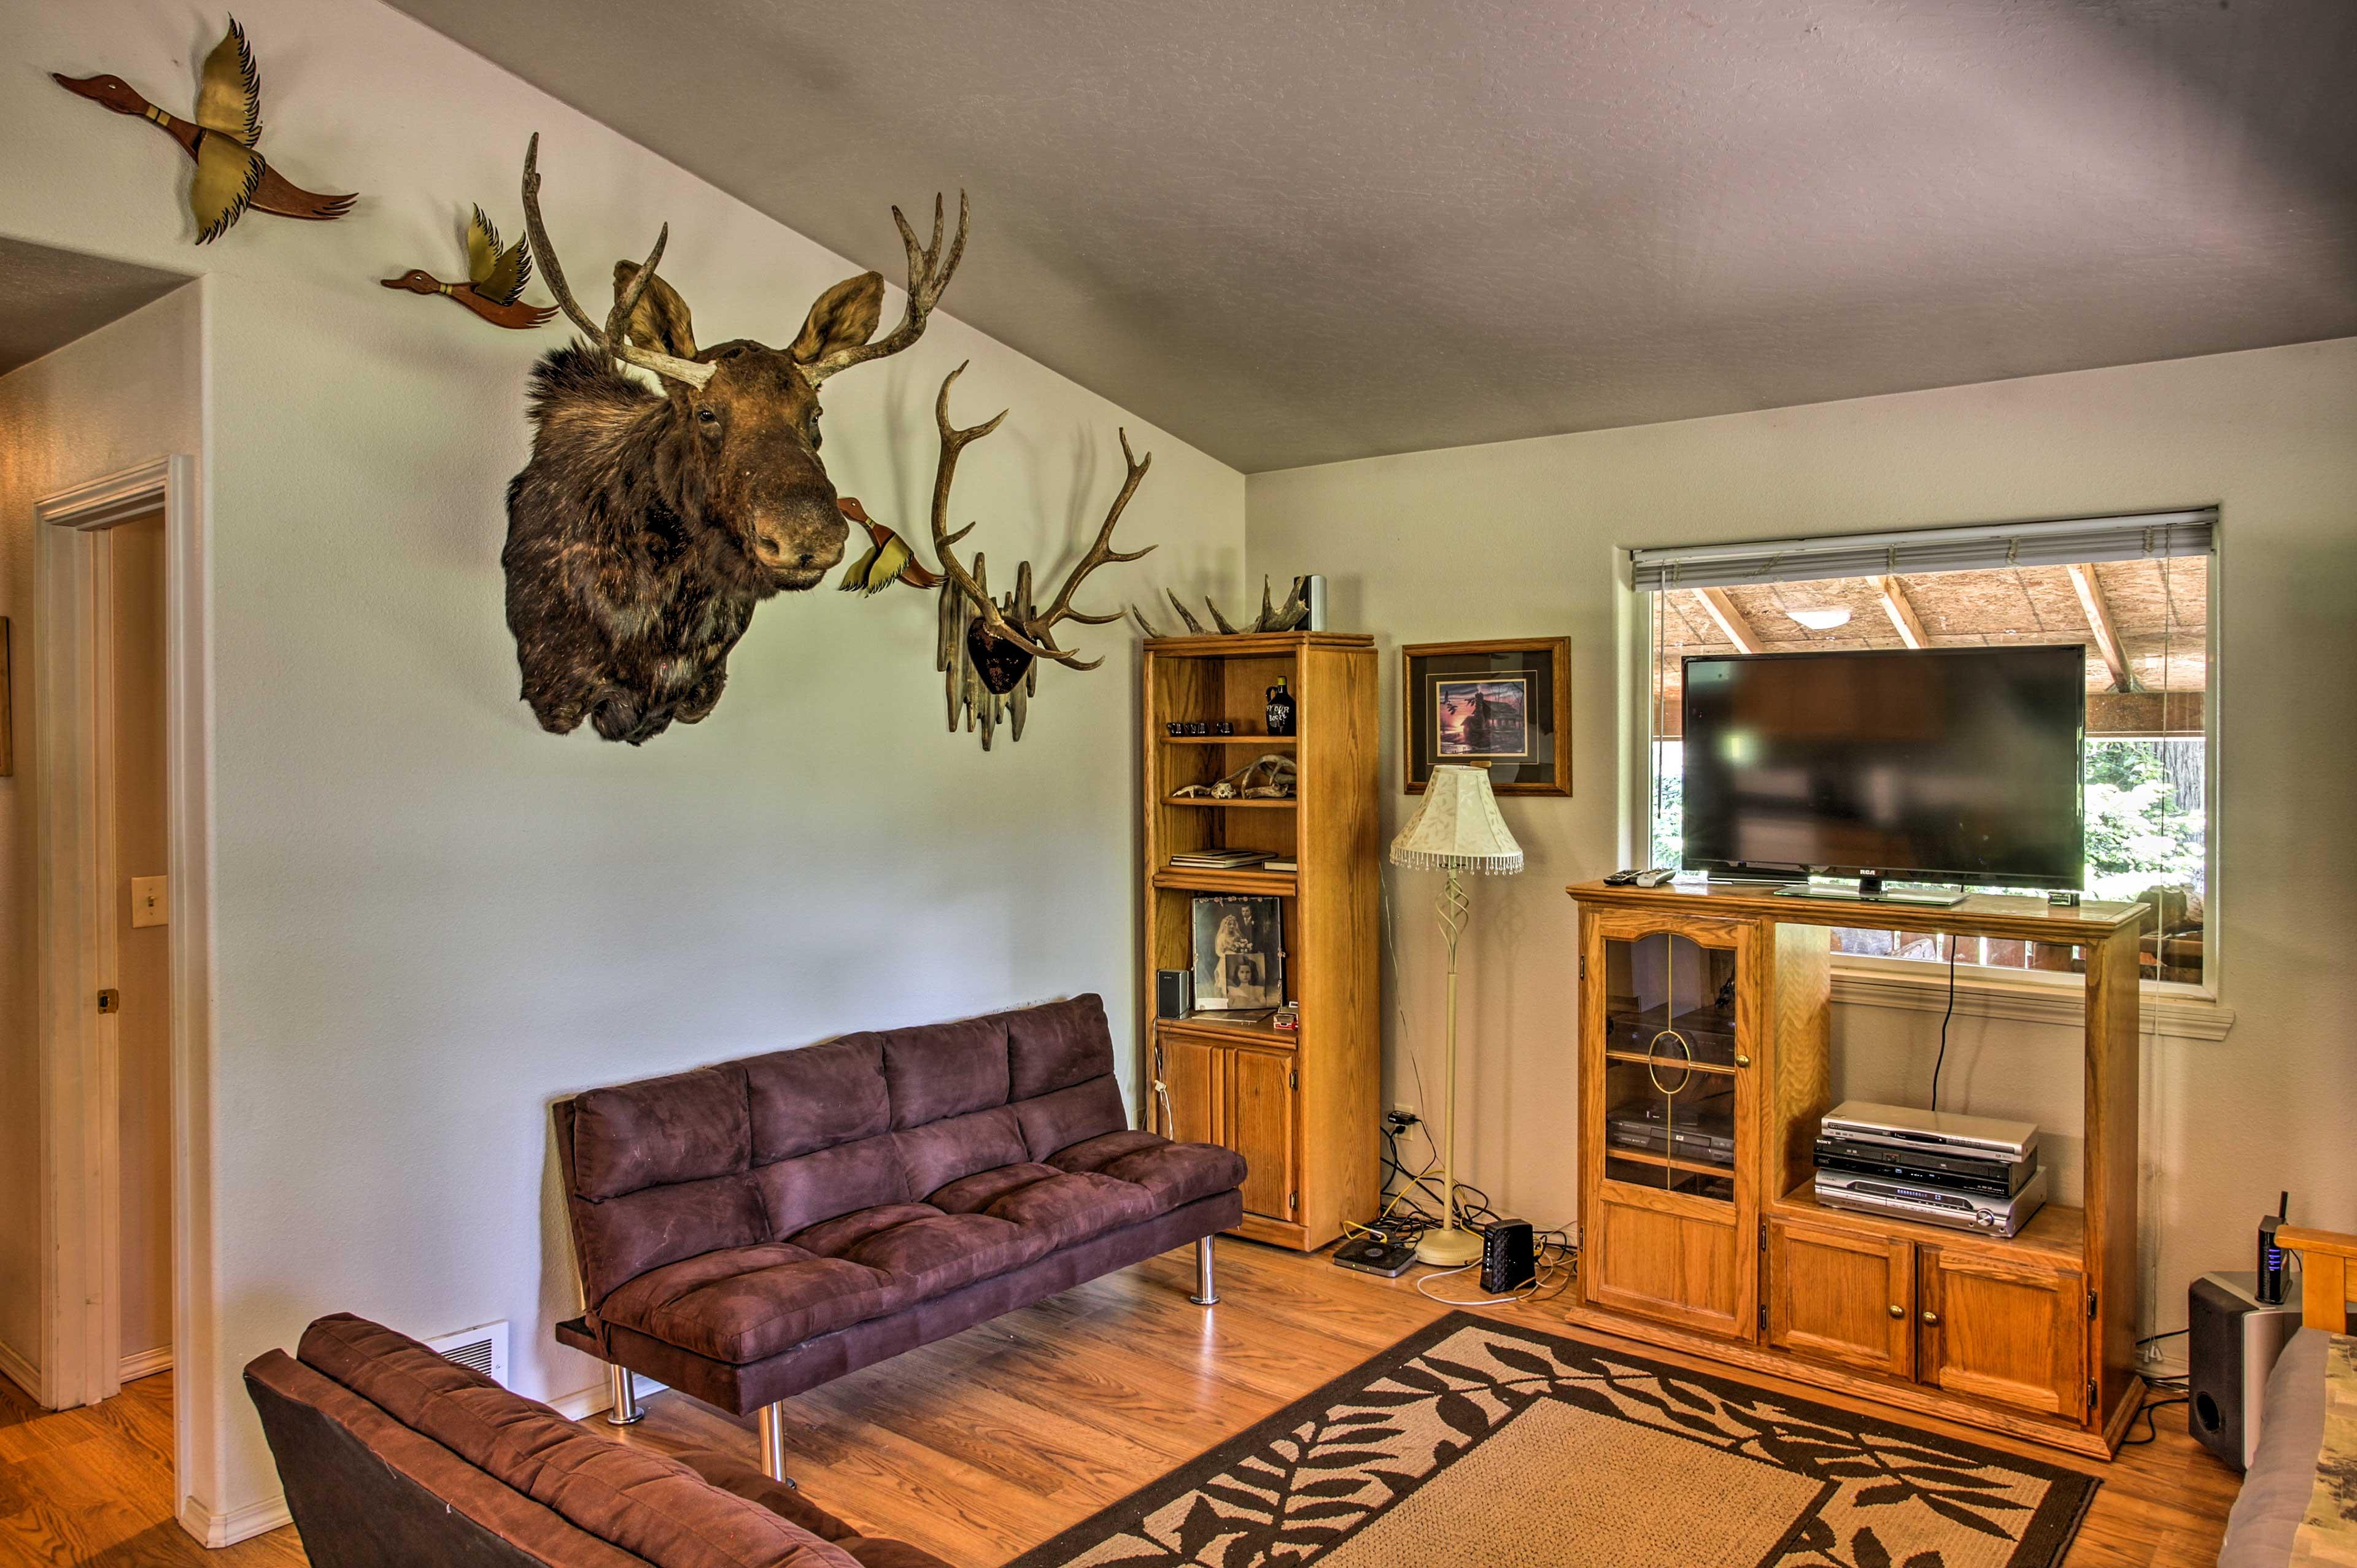 Living Room   2 Futons   Satellite TV